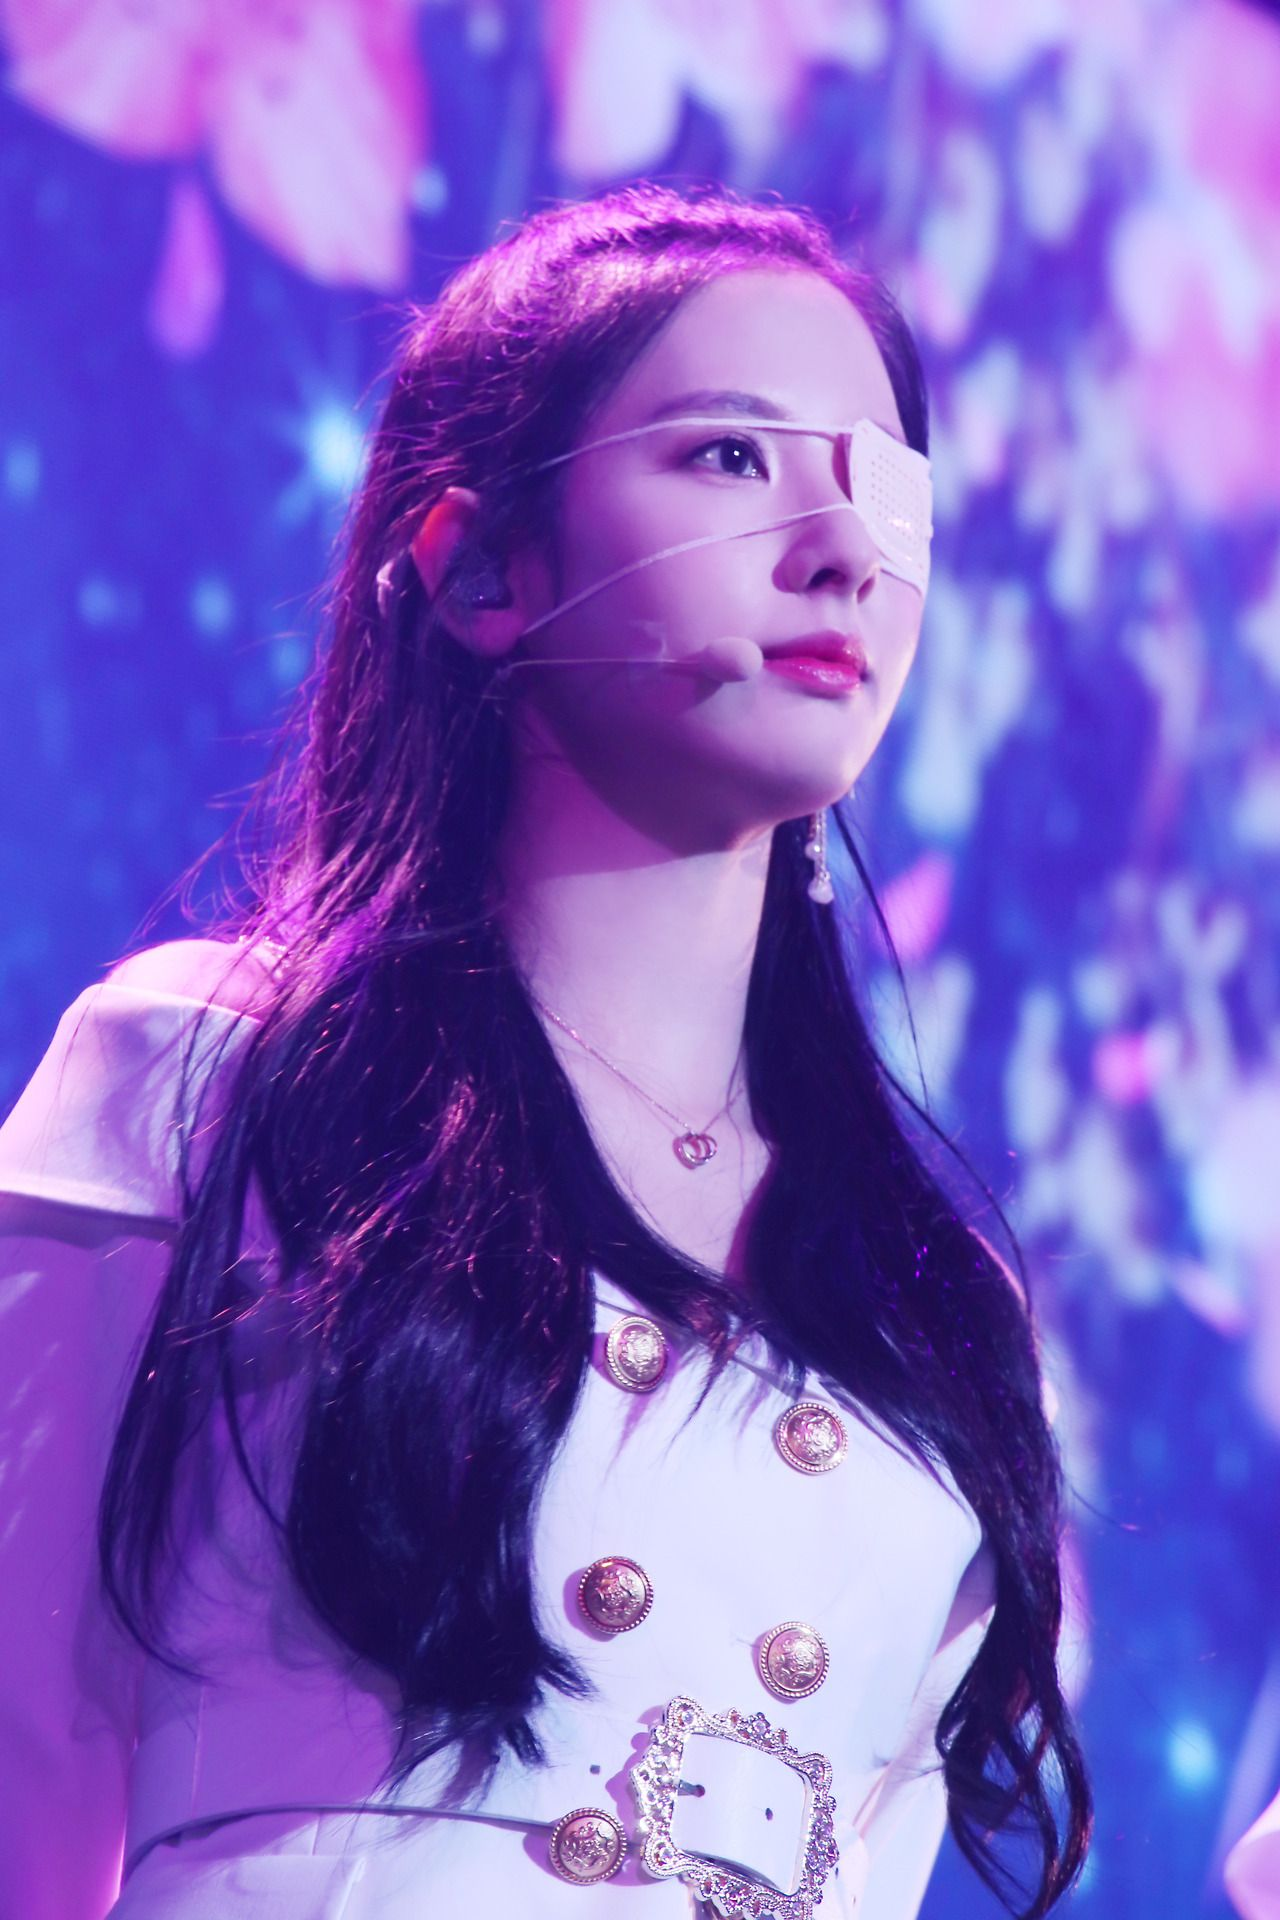 Download All Your Favorite Jpop And Kpop Songs Iomoio Jpop Kpop Jpop Mp3 Music Downloads Cosmic Girls